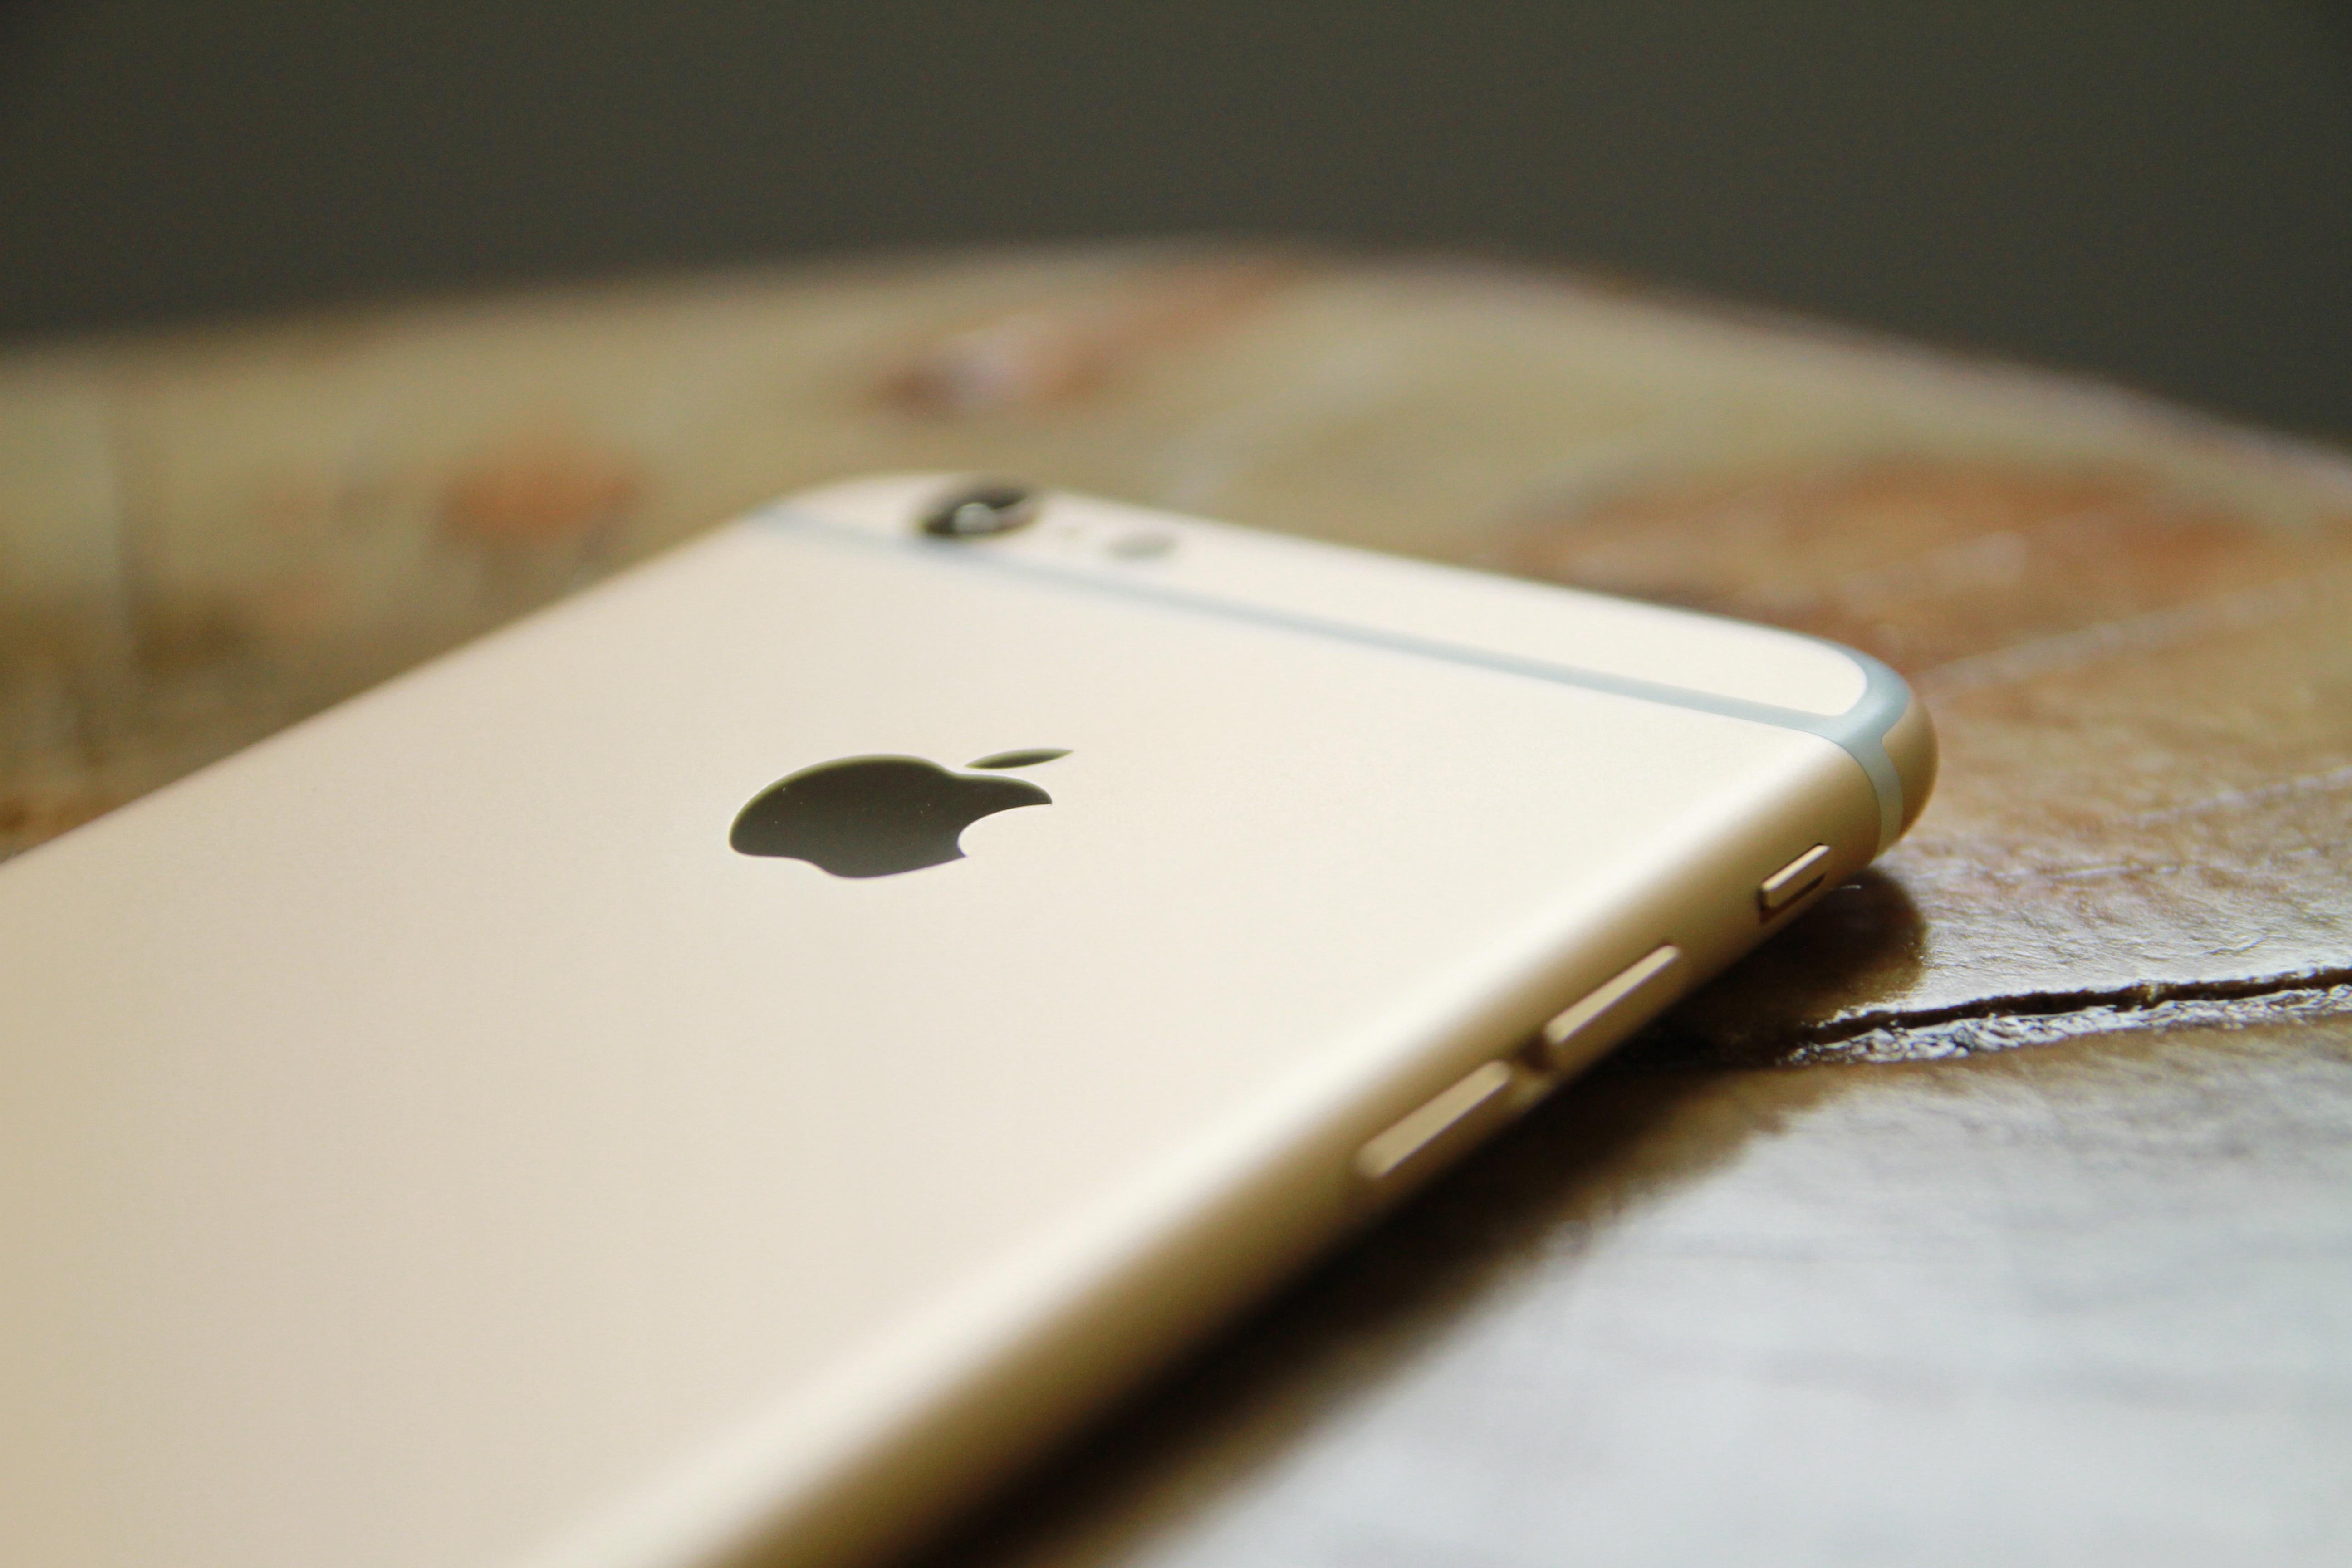 I phone, Apple, Curve, Curvy, Elegant, HQ Photo